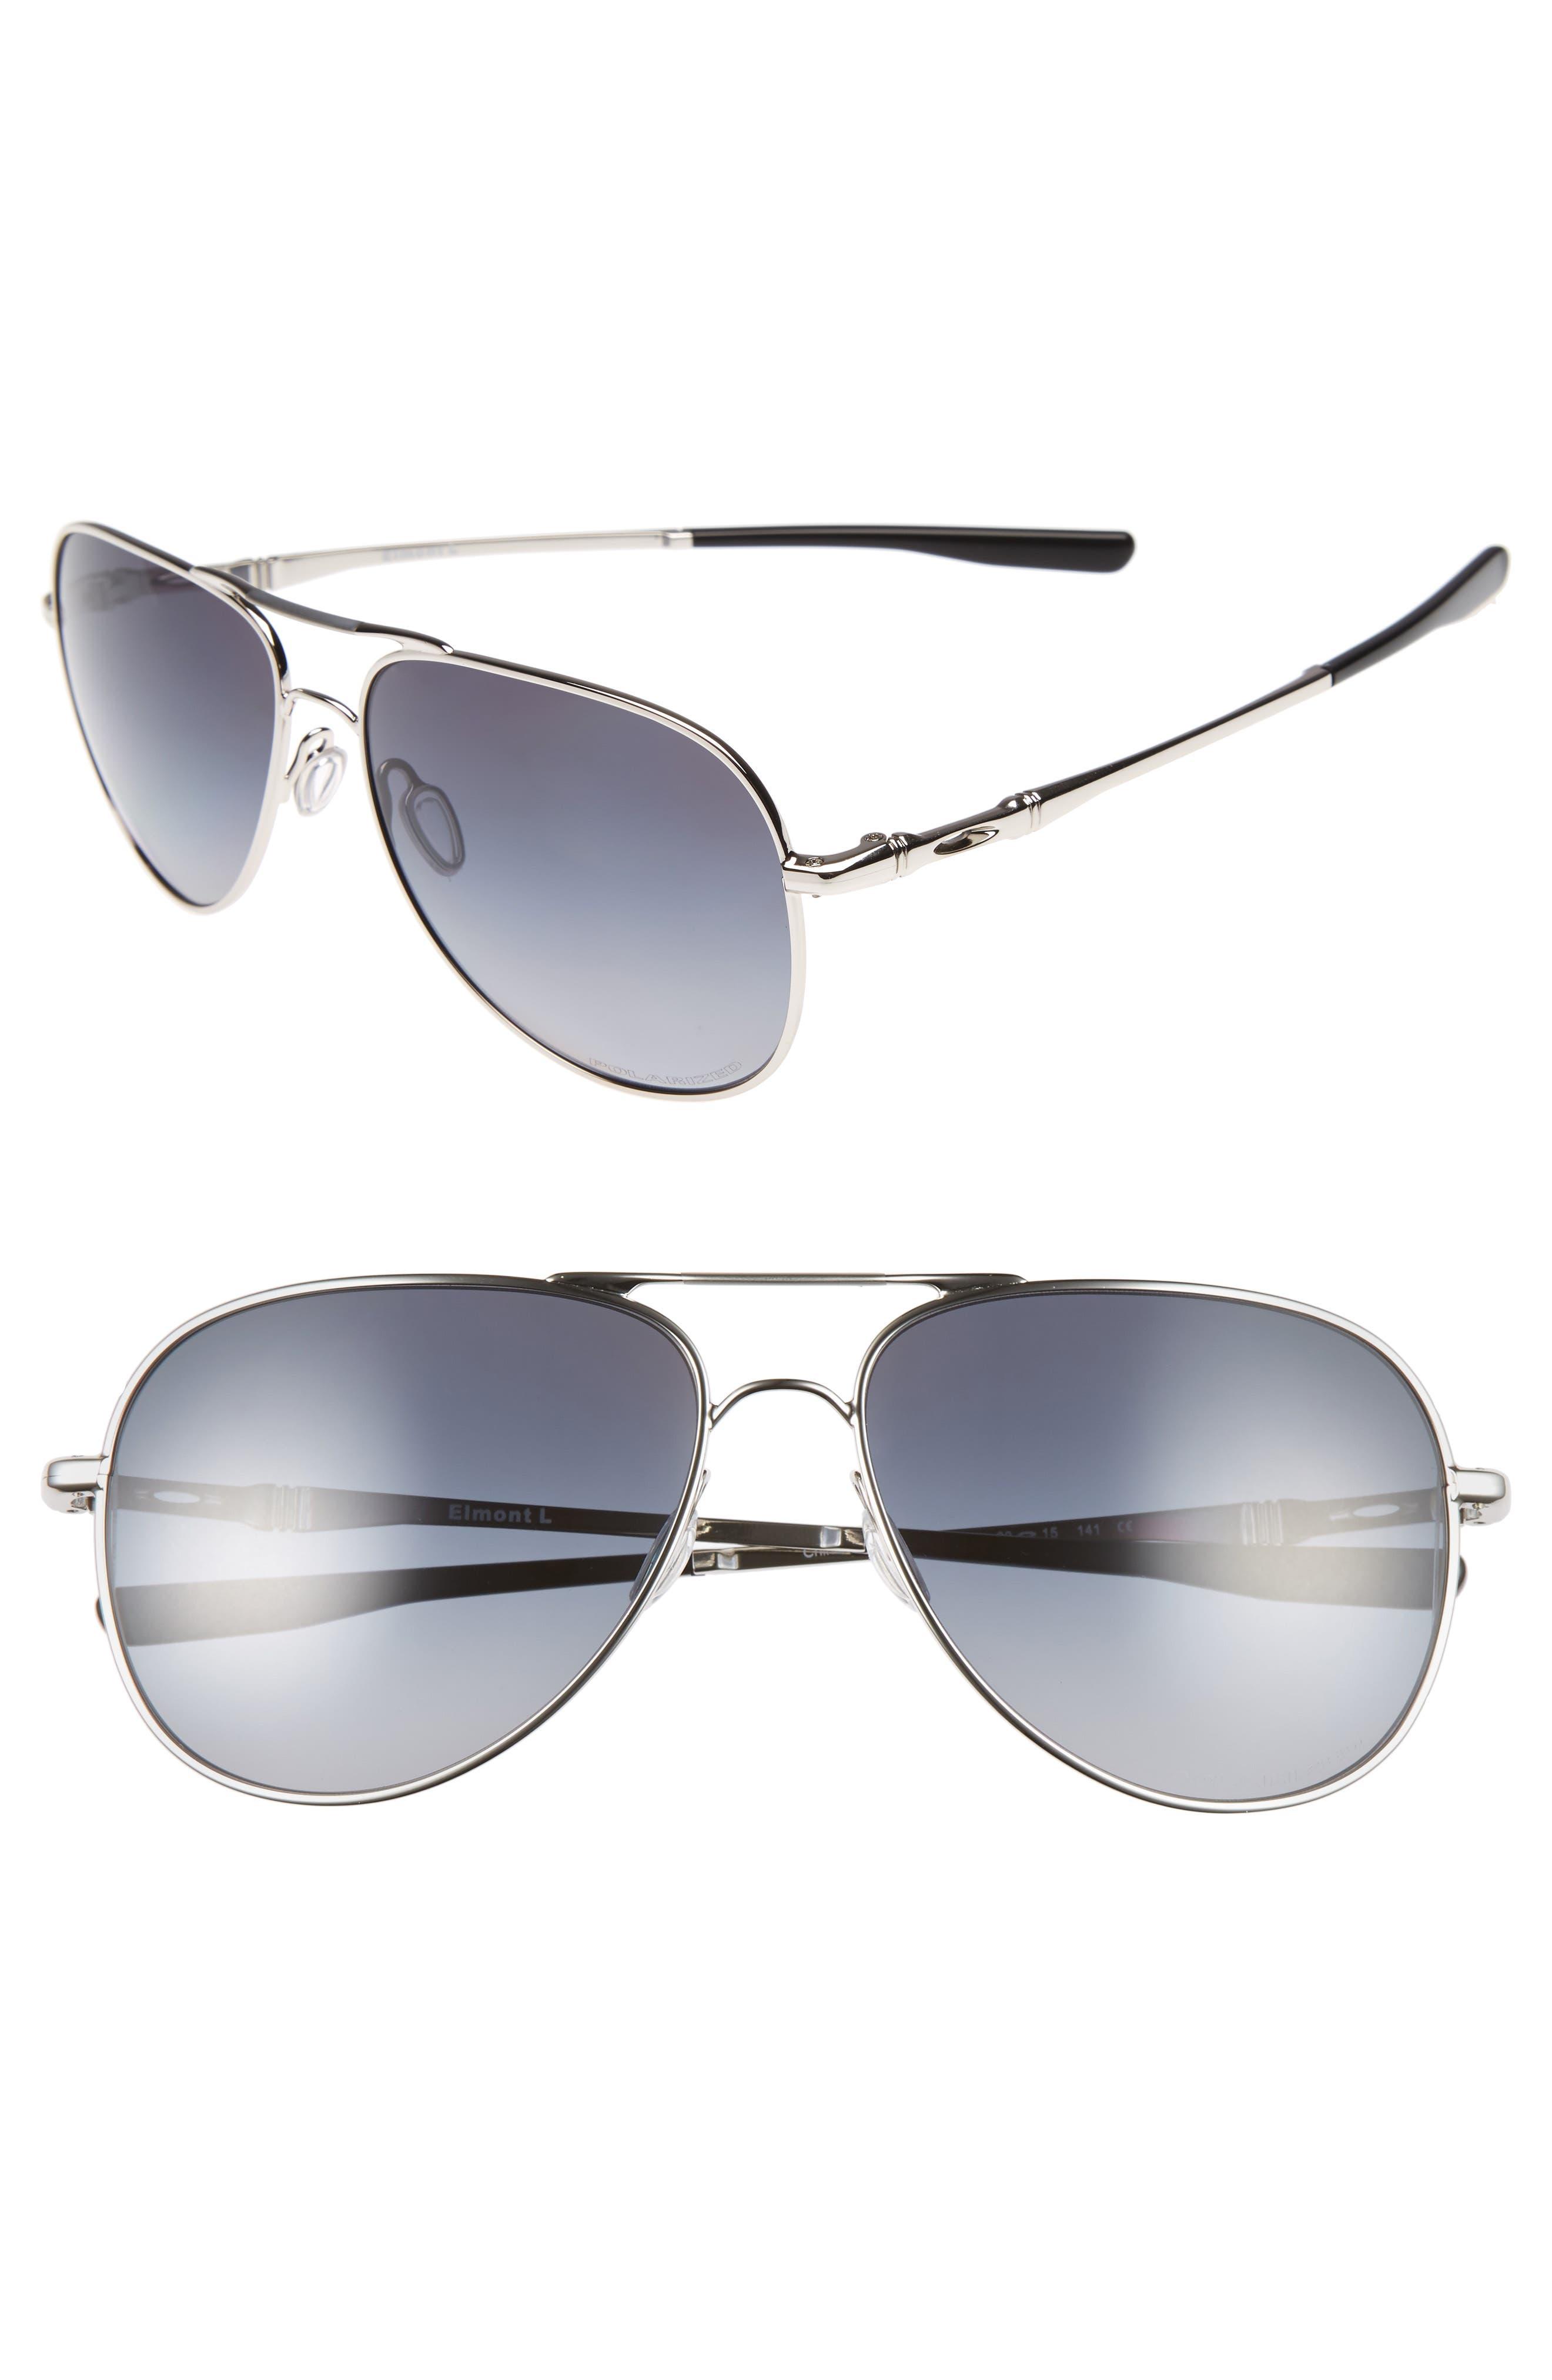 Oakley Elmont 61Mm Polarized Aviator Sunglasses -